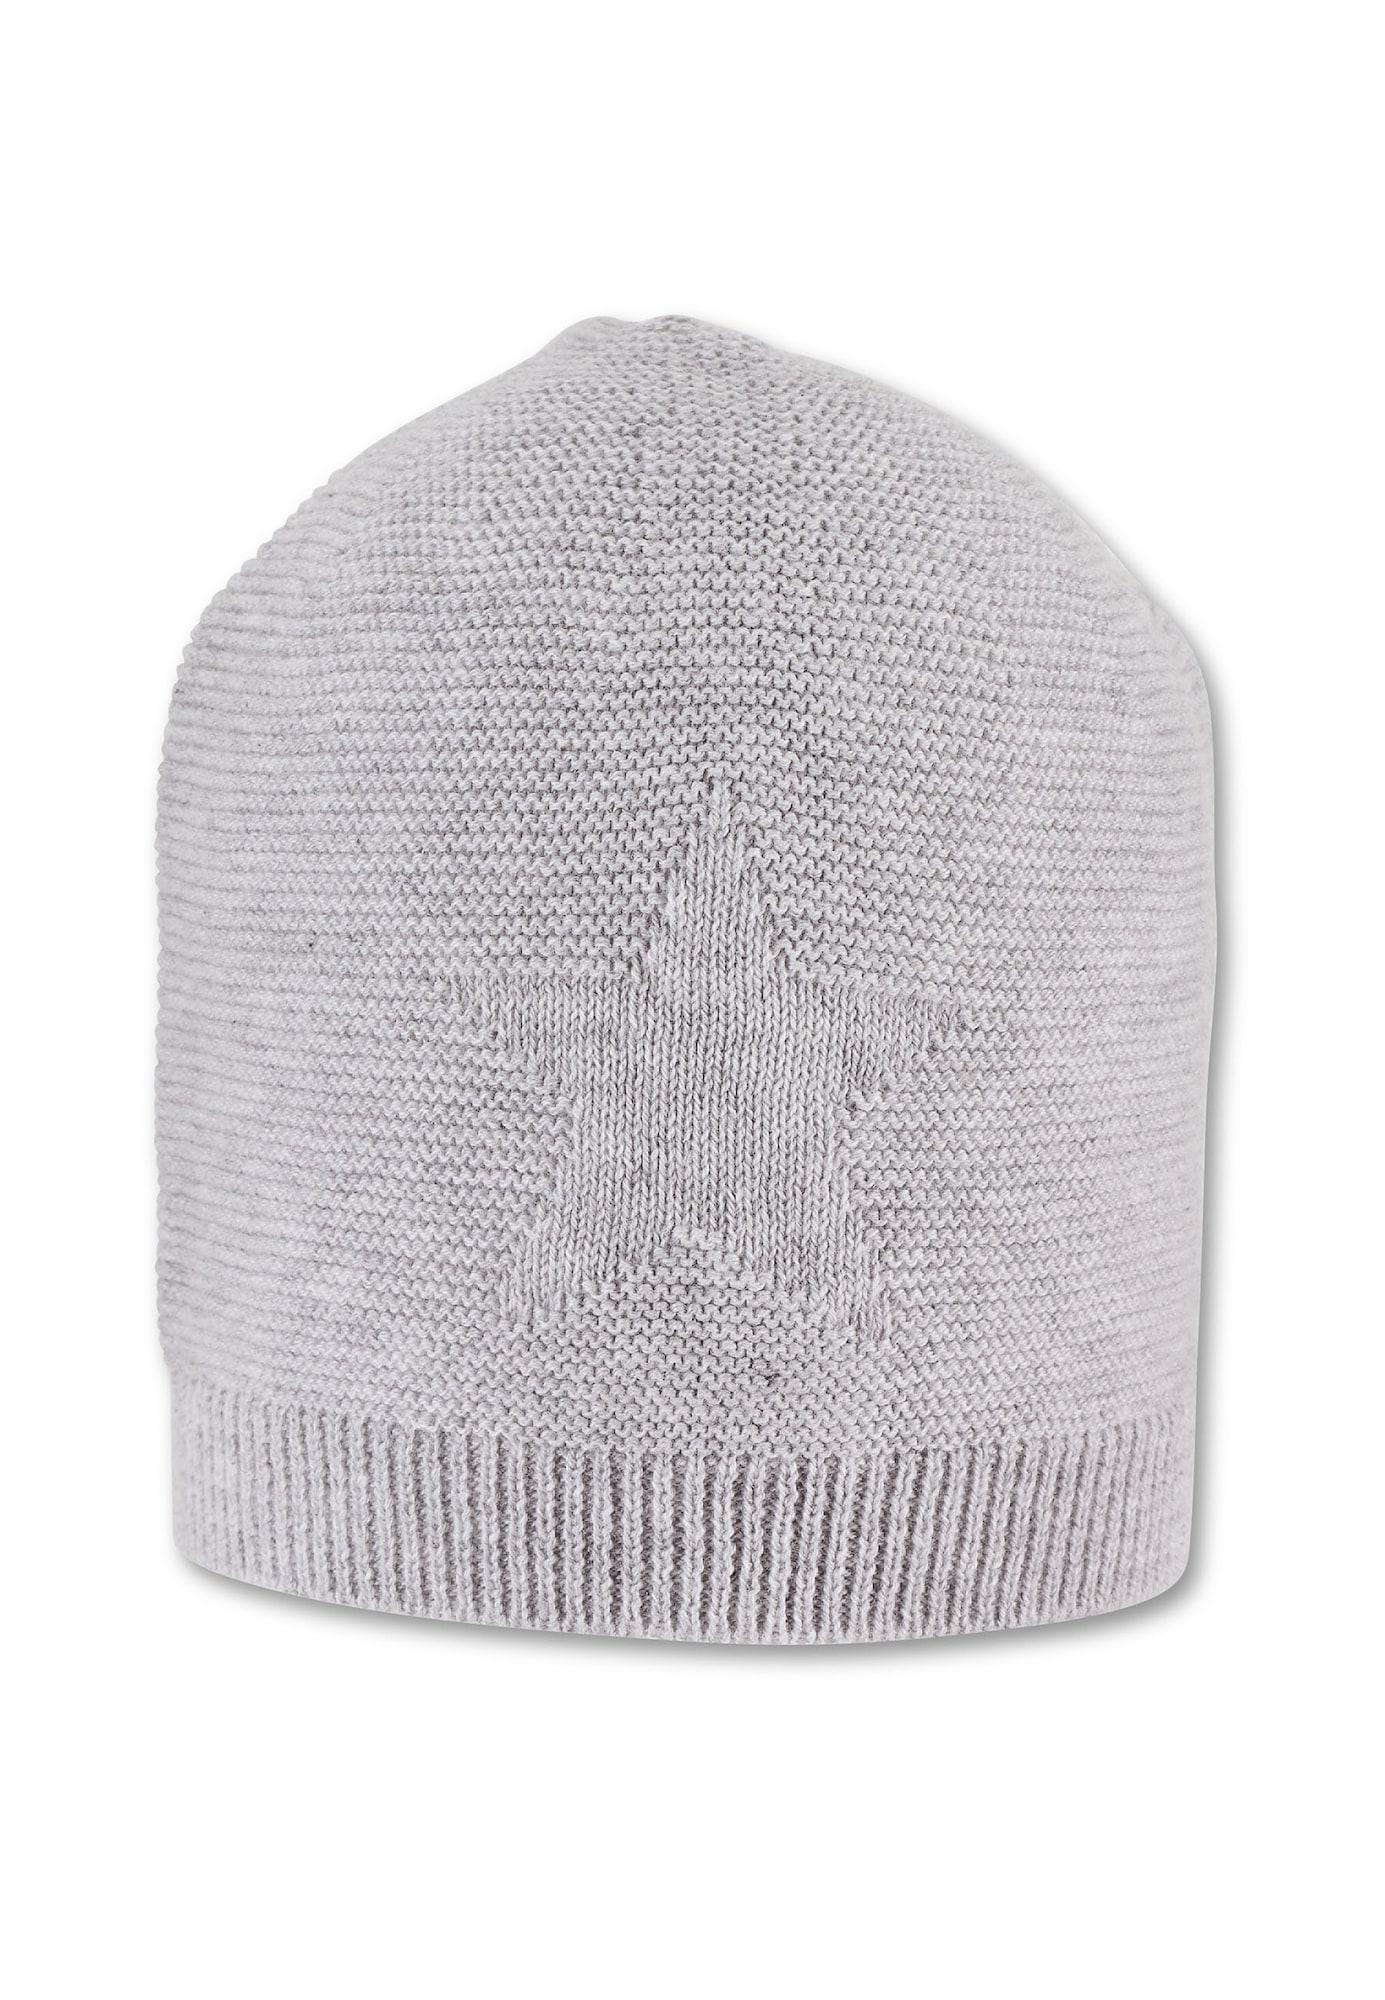 STERNTALER Megzta kepurė šviesiai pilka